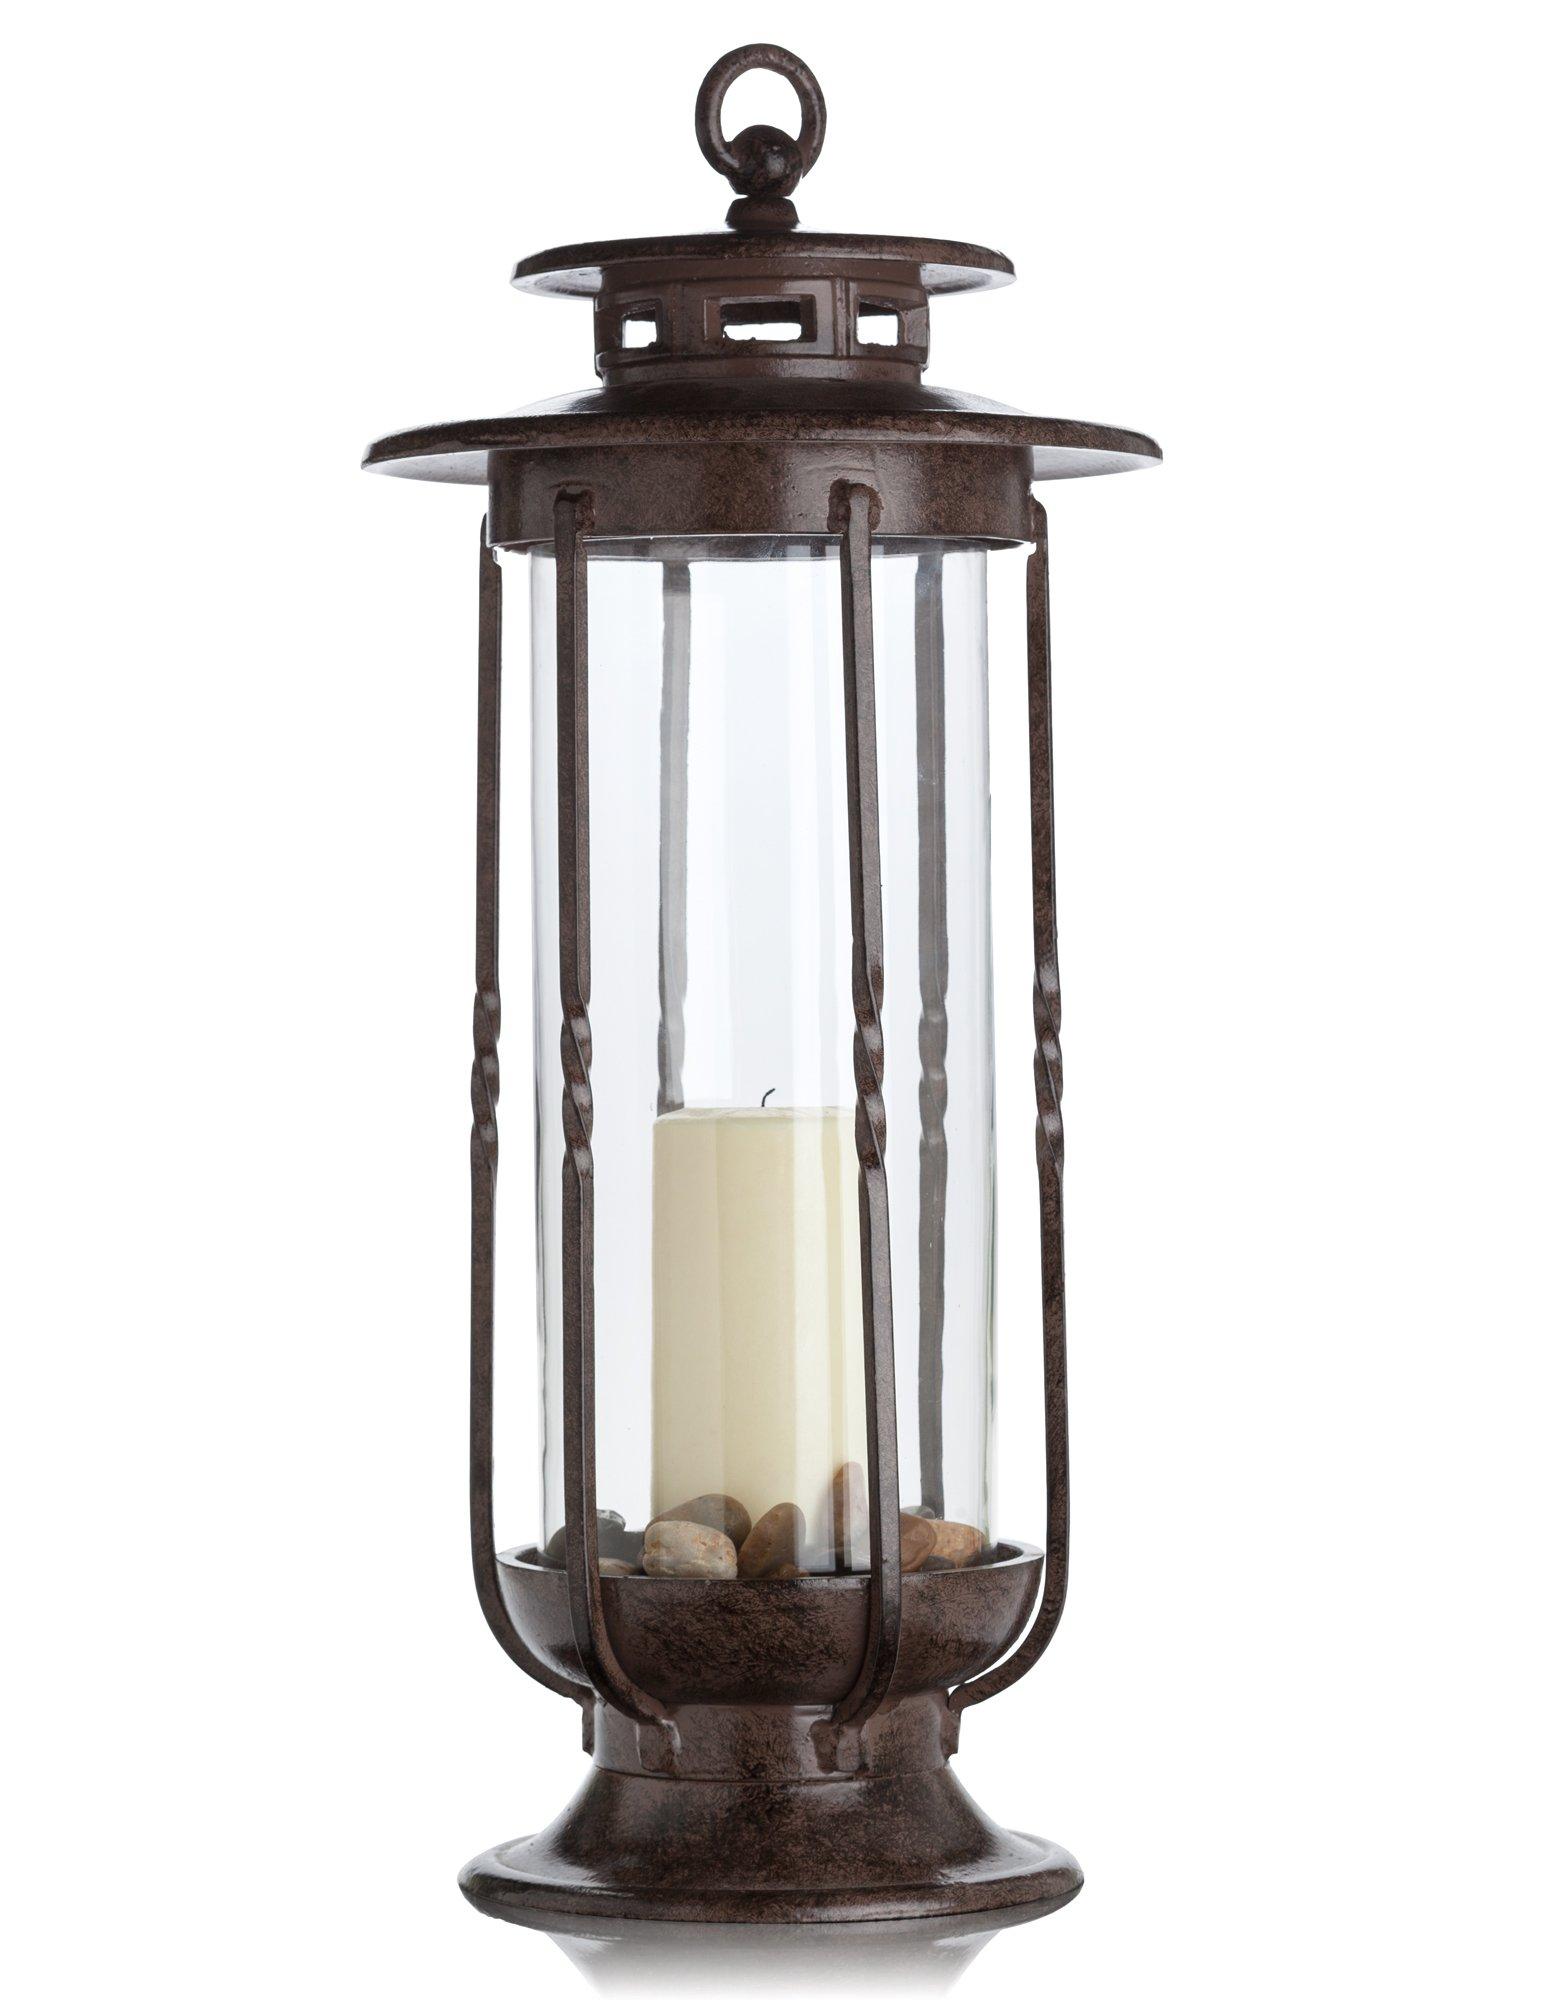 h potter decorative outdoor hurricane candle lantern holder patio wedding indoor 694991973766 ebay. Black Bedroom Furniture Sets. Home Design Ideas